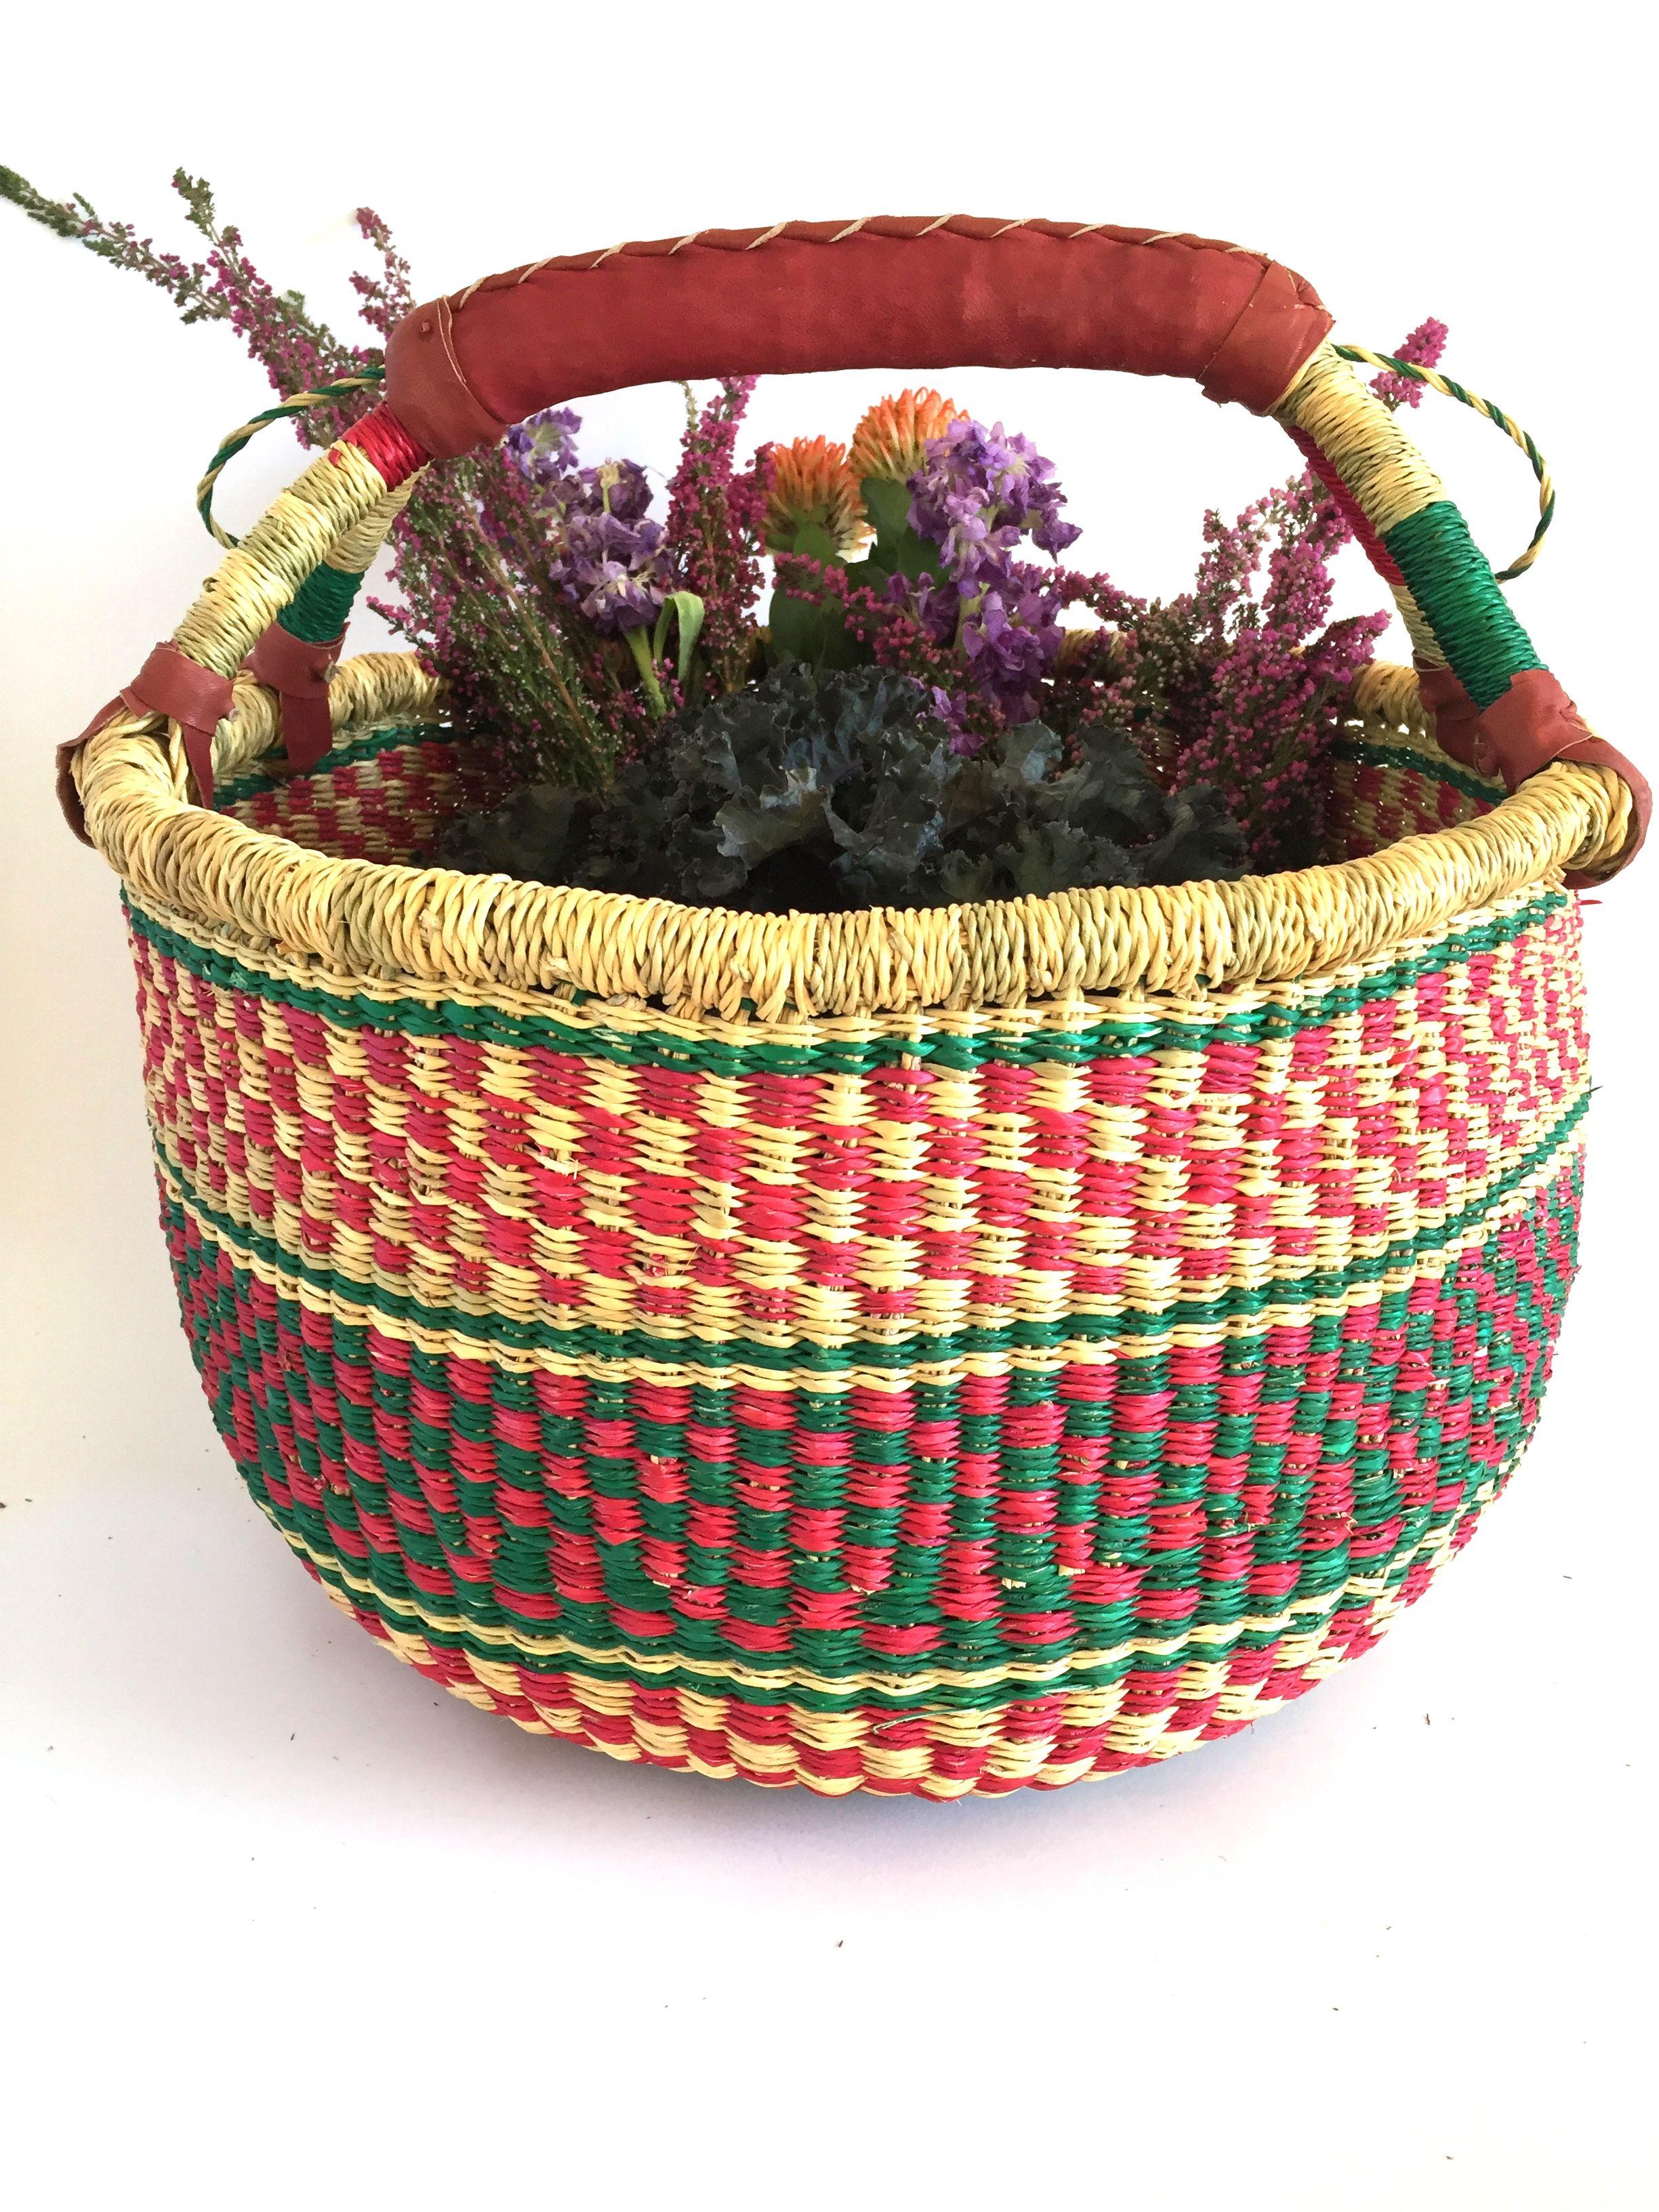 Farmers market cosa buena local support produce fresh